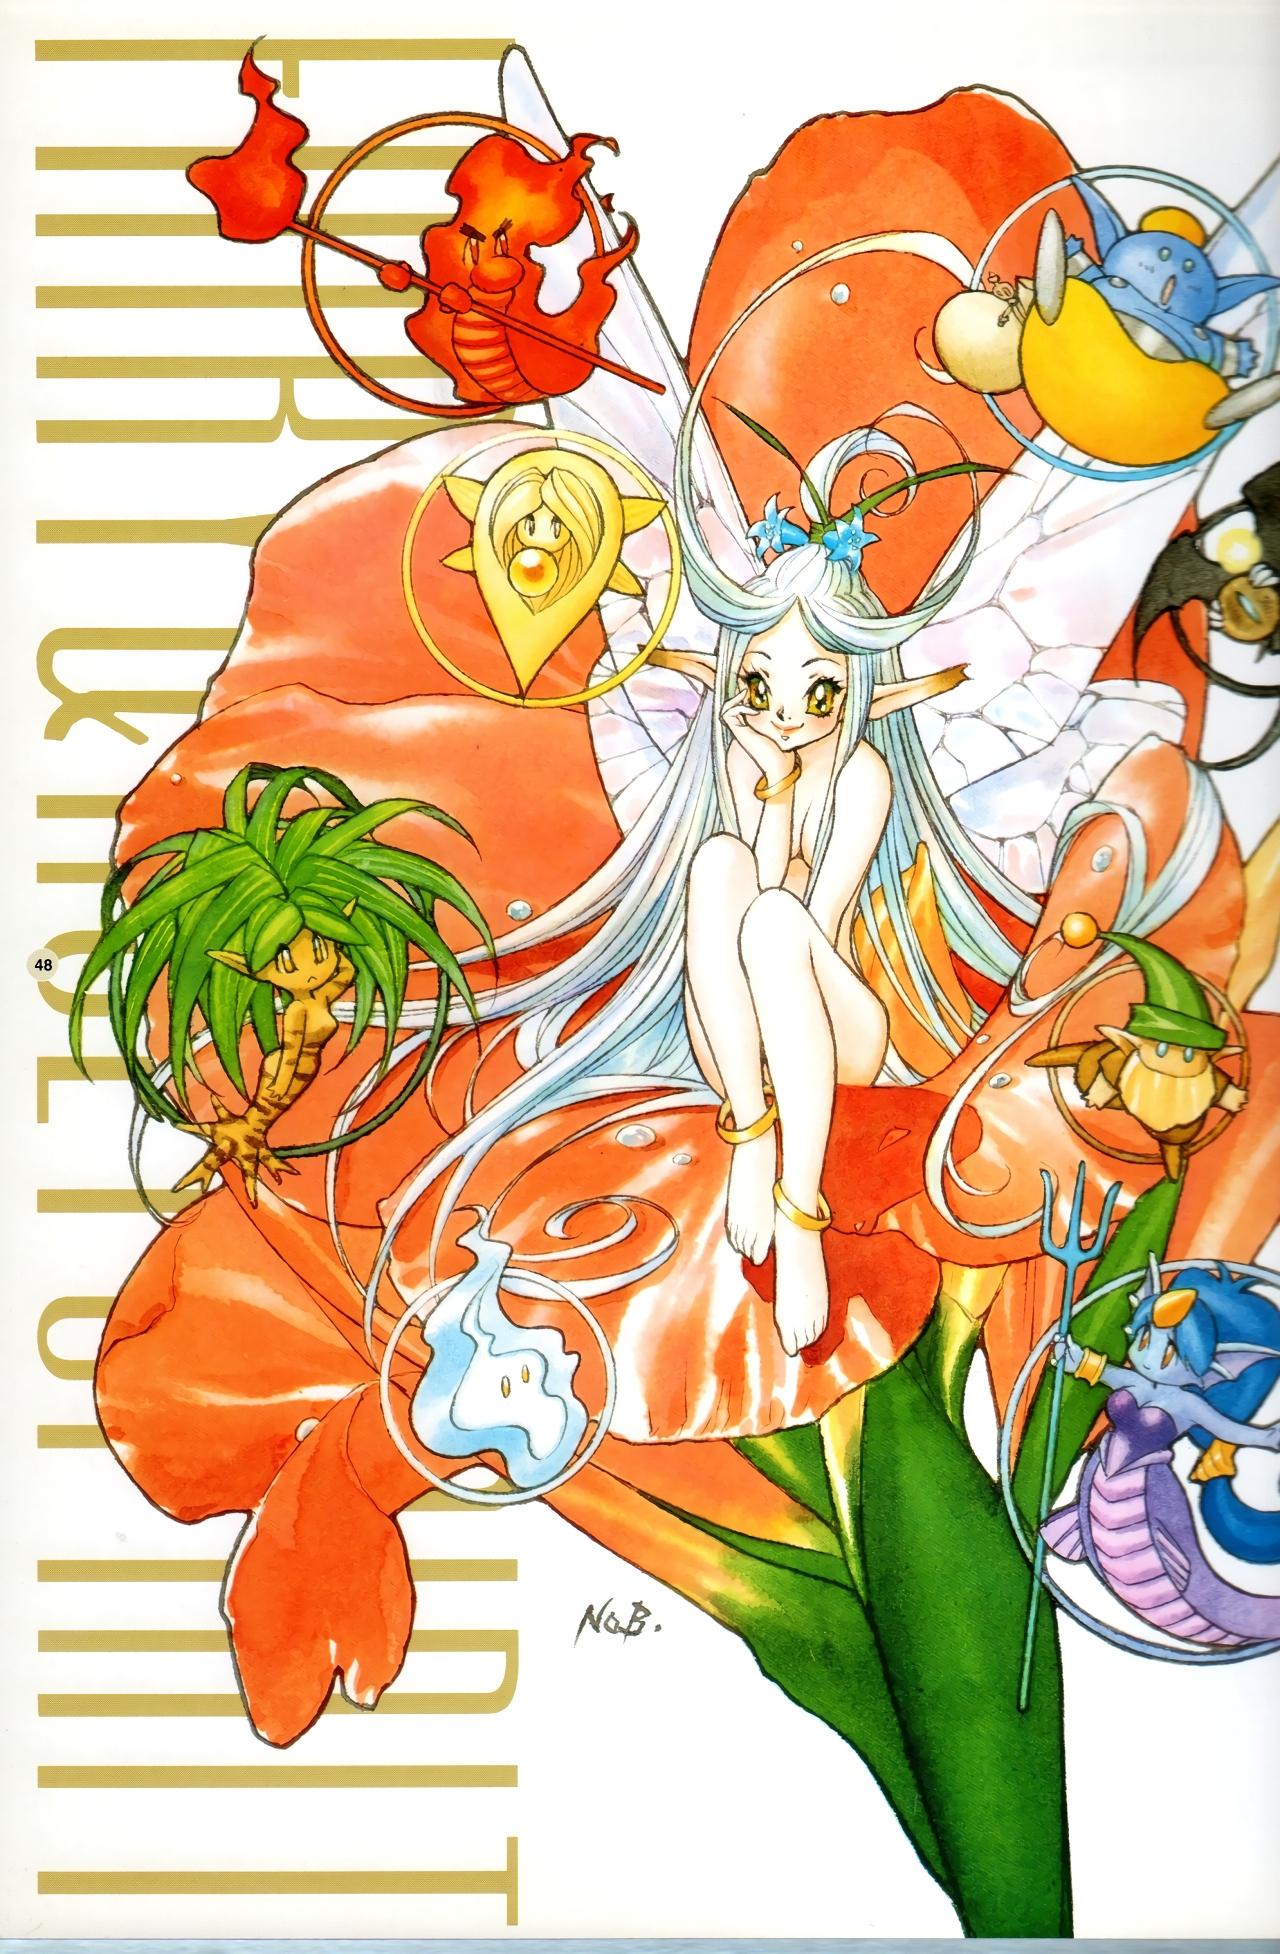 Seiken Densetsu 3 Illustration Book - Fairy